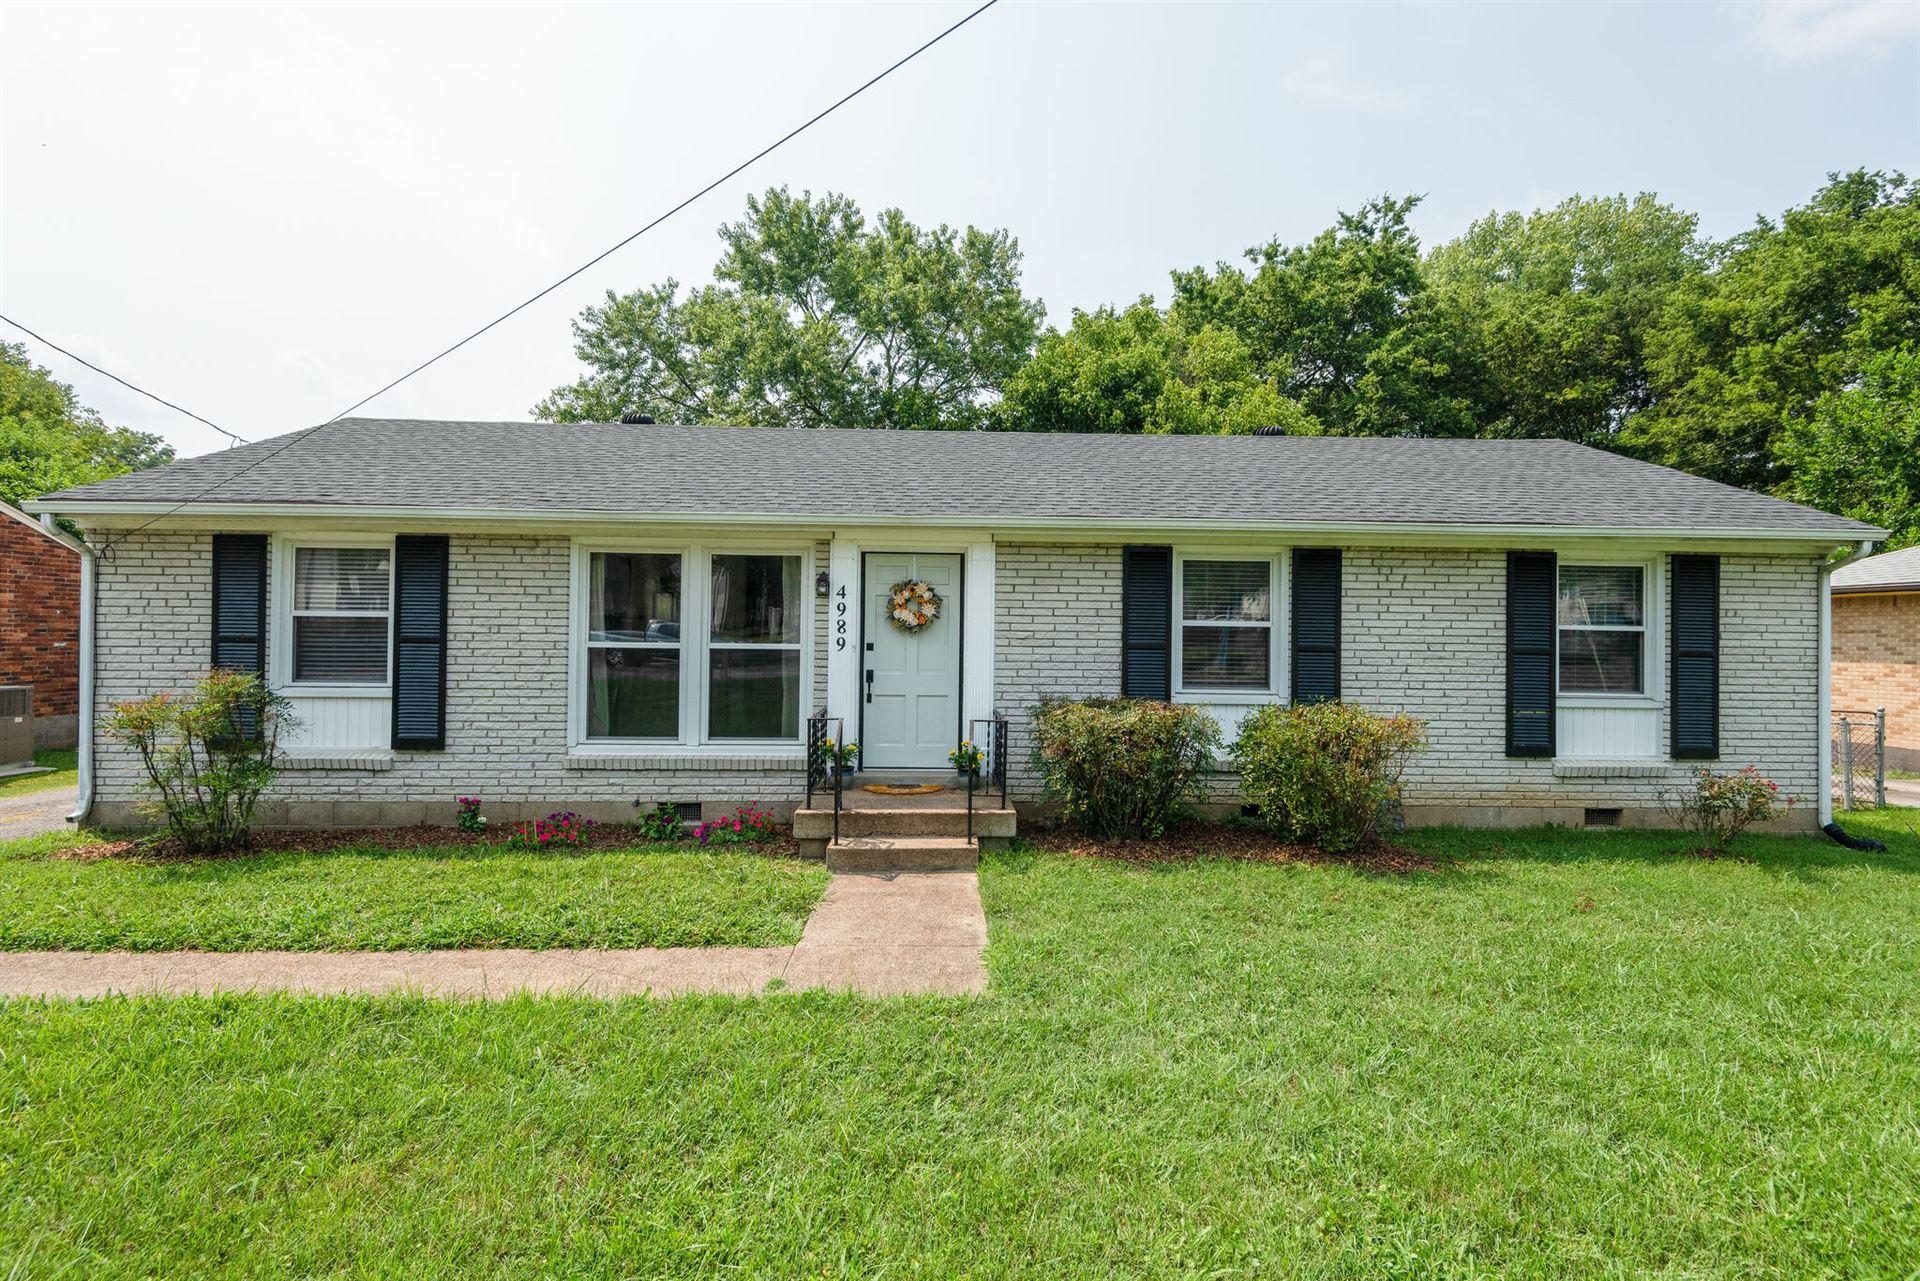 4989 Edmondson Pike, Nashville, TN 37211 - MLS#: 2277932